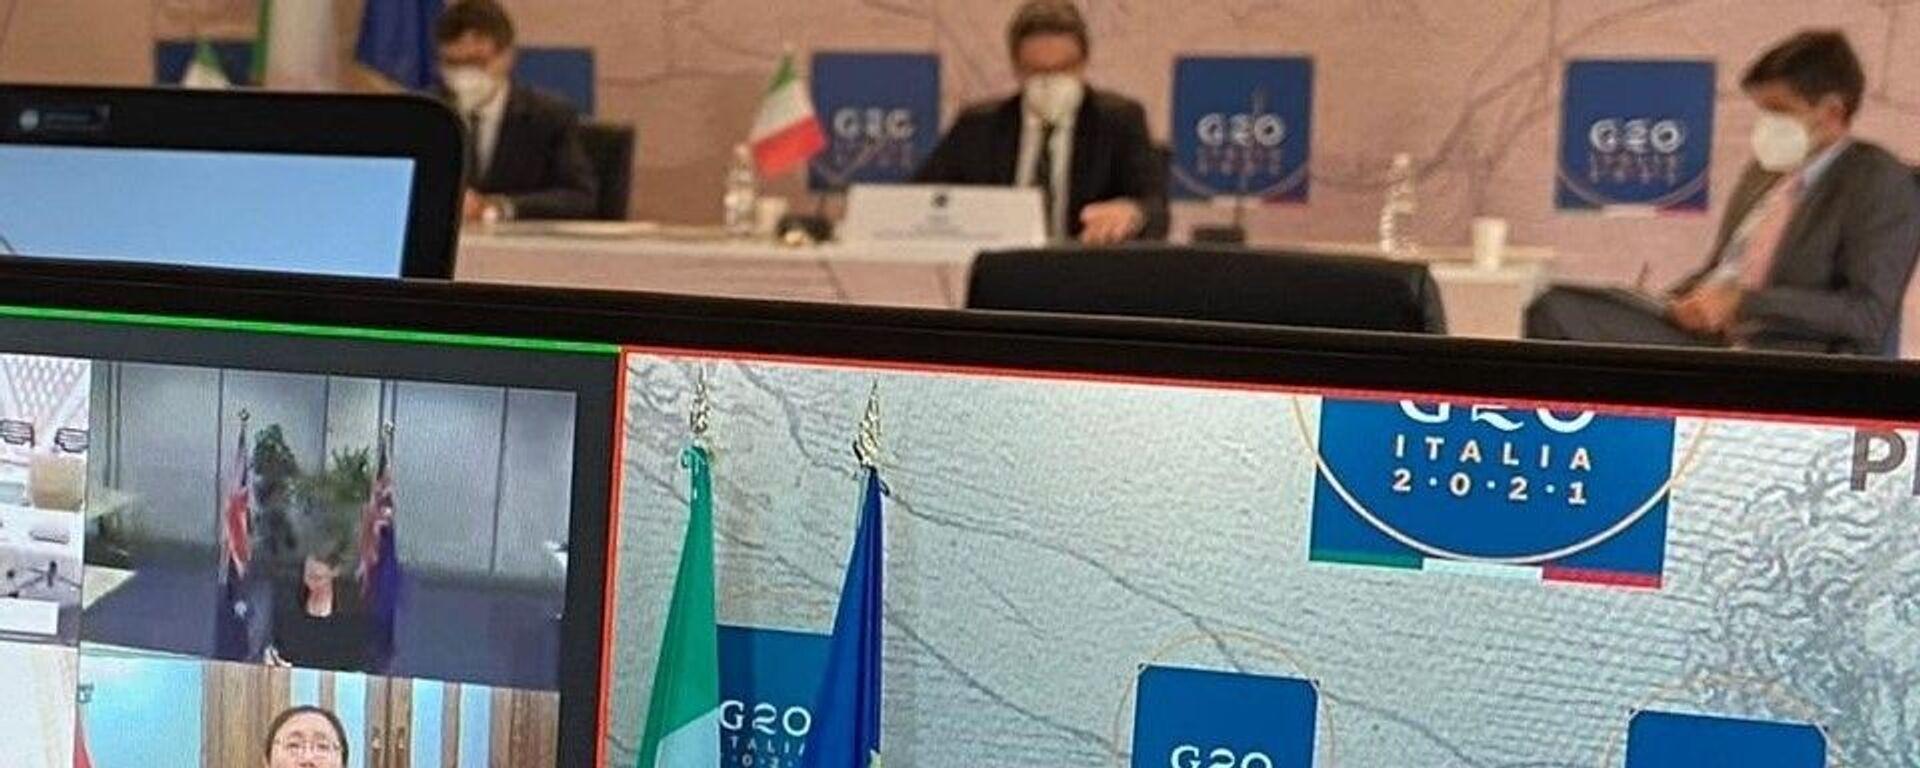 G20 Italia - Sputnik Italia, 1920, 02.01.2021